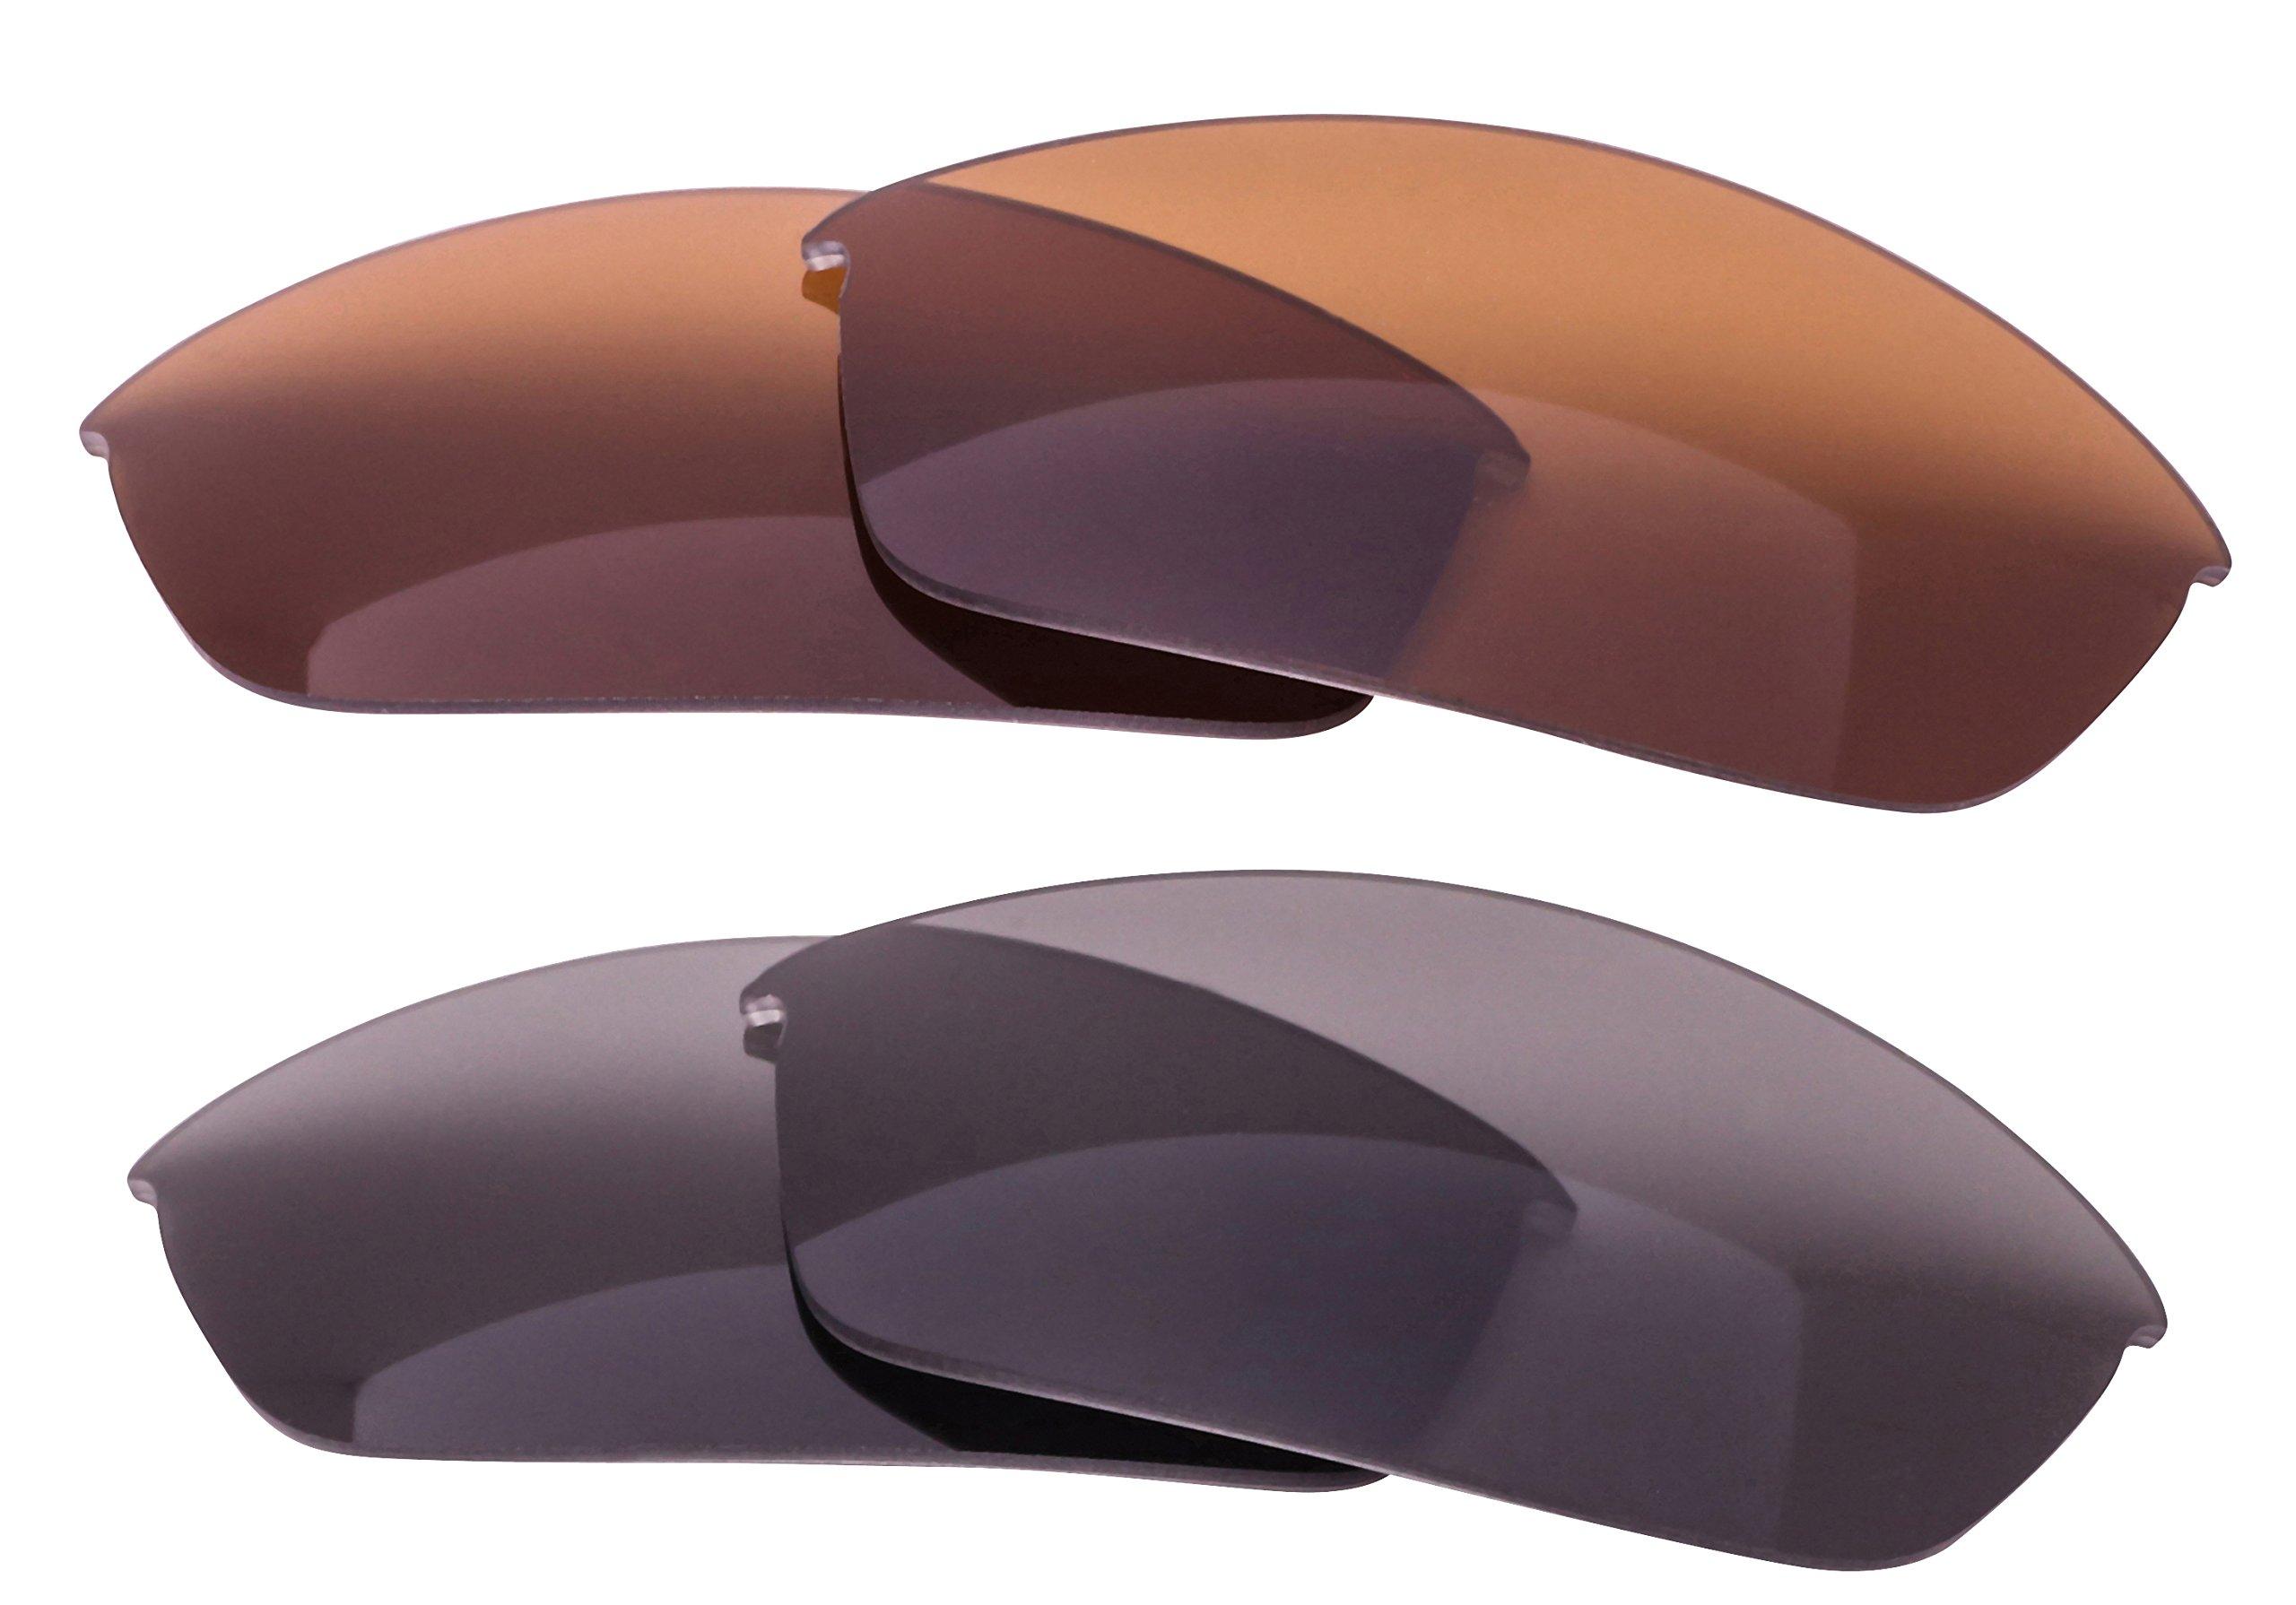 LenzFlip Oakley FLAK JACKET Lens Replacement - Basic Combo 2 Pk- Gray & Brown Polarized by LenzFlip